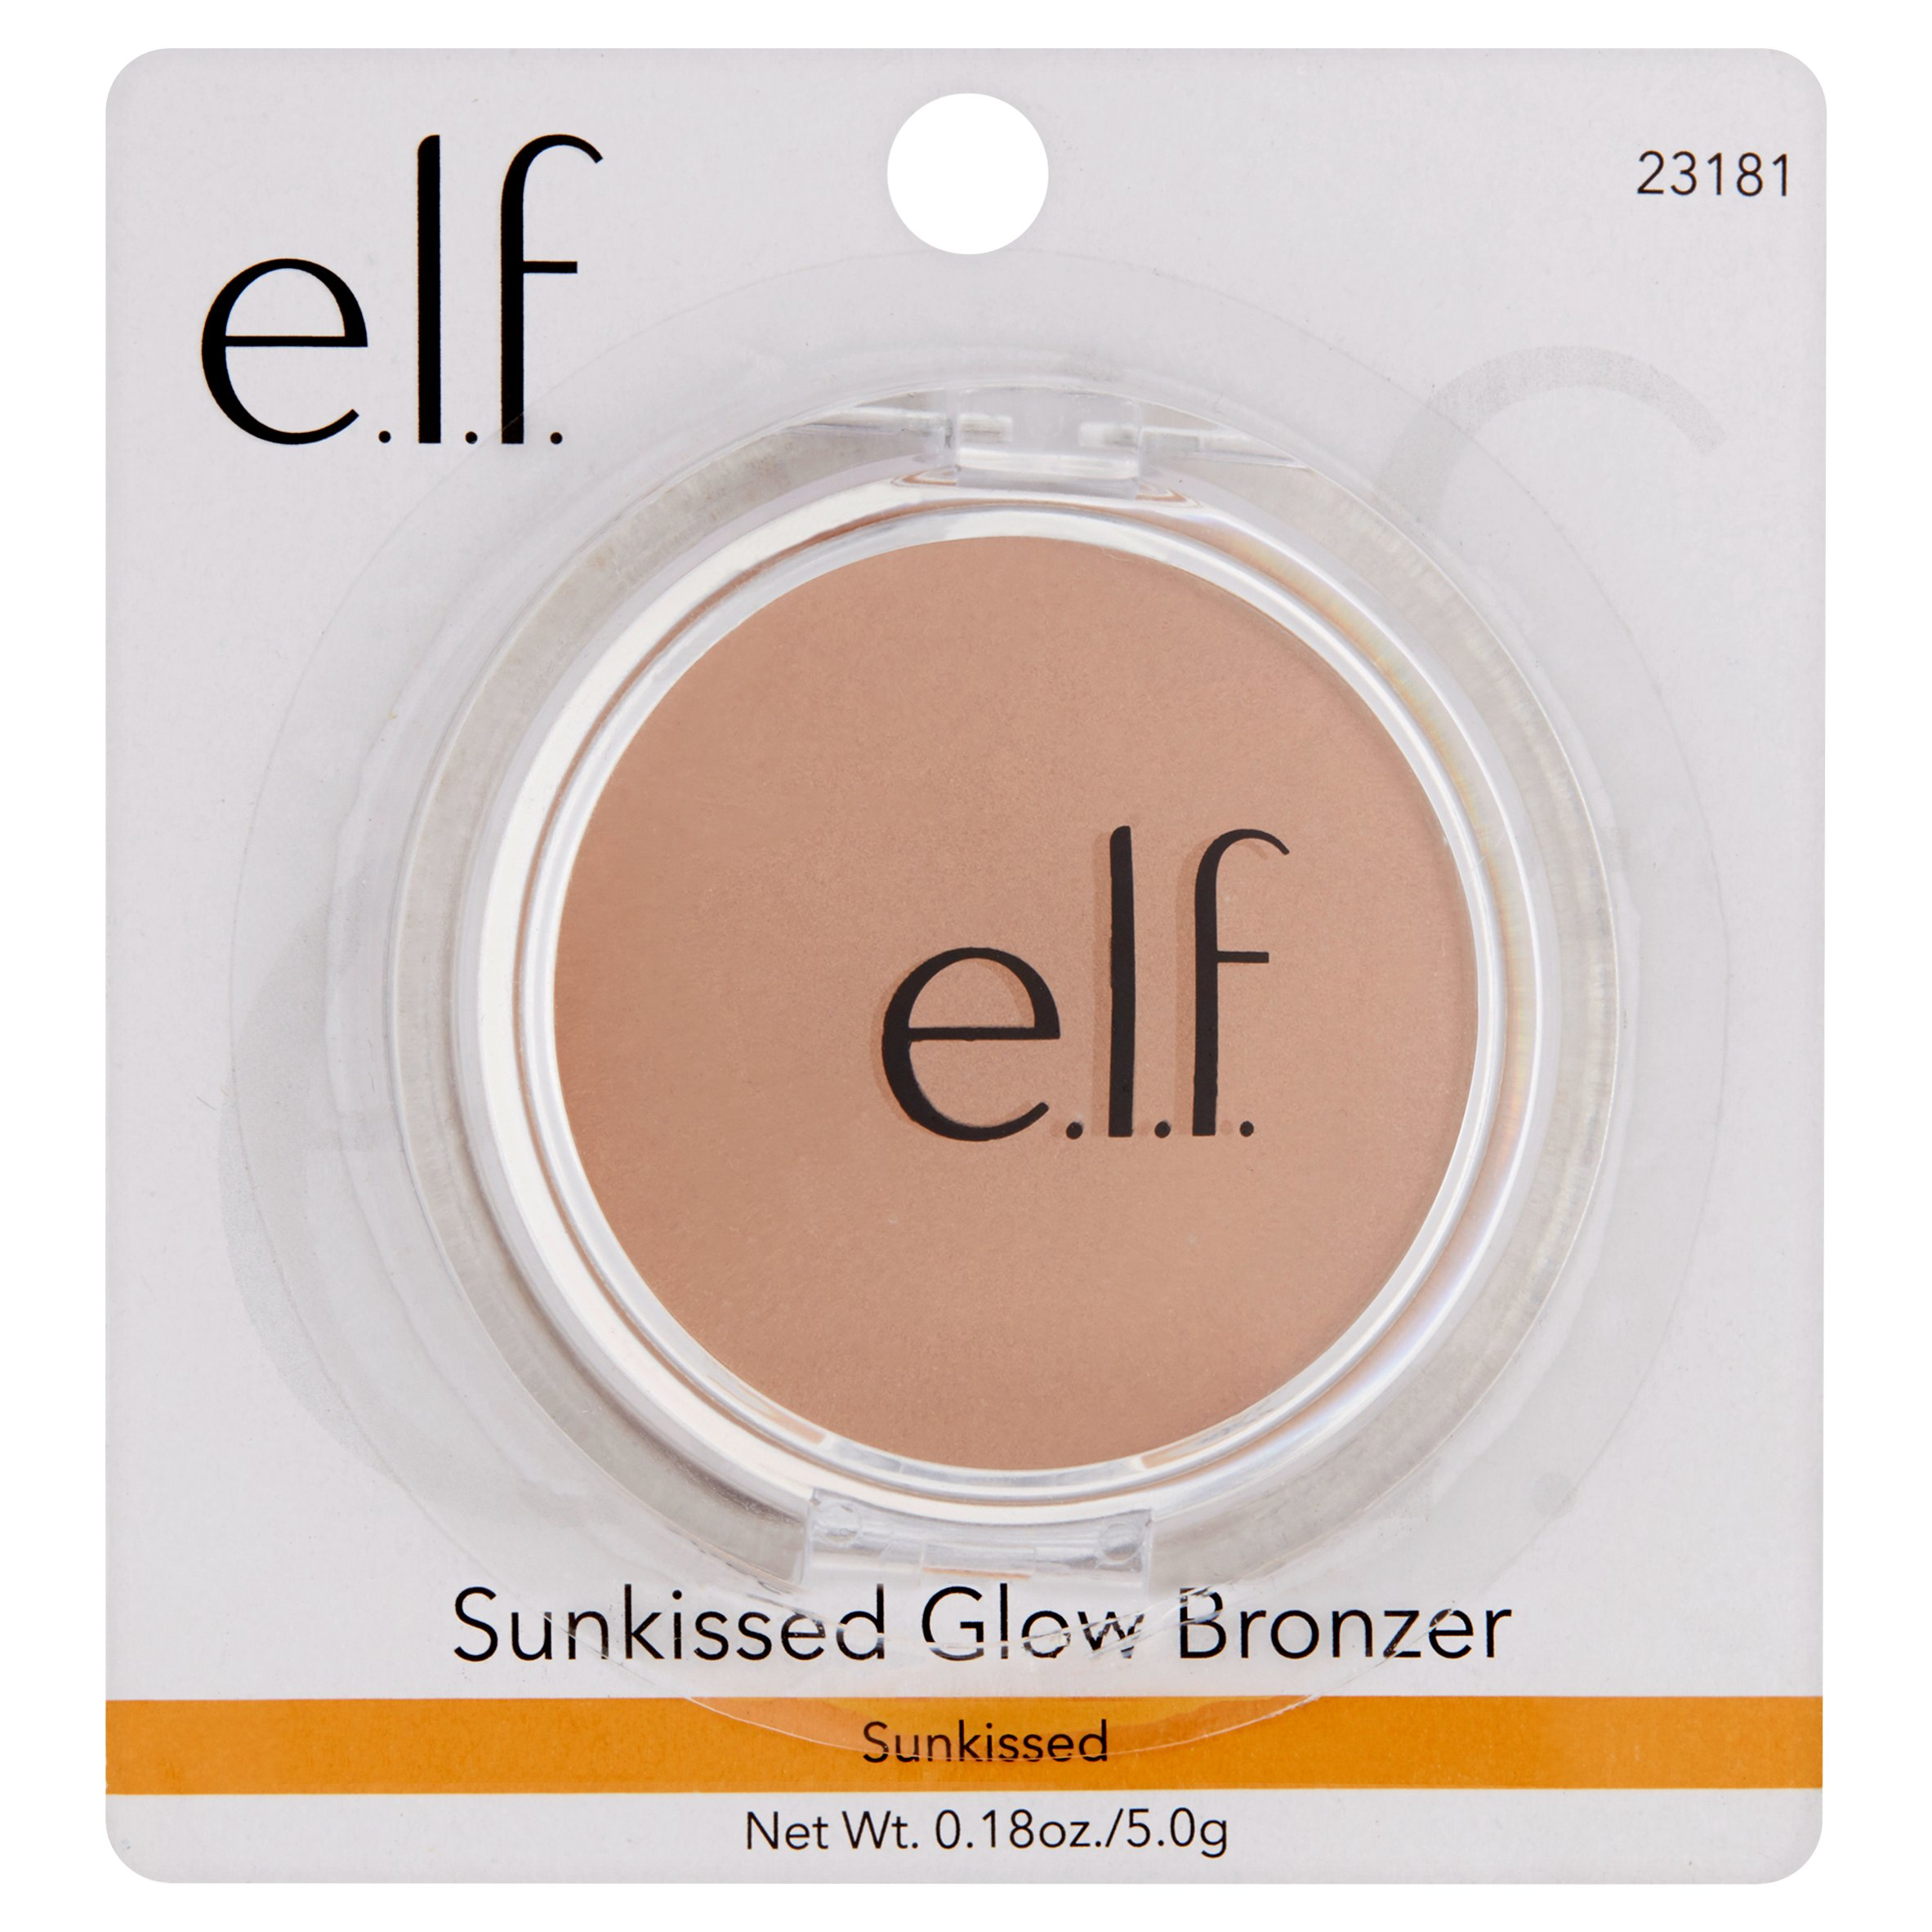 e.l.f. Sunkissed Glow Bronzer, Sun Kissed, 0.18 oz